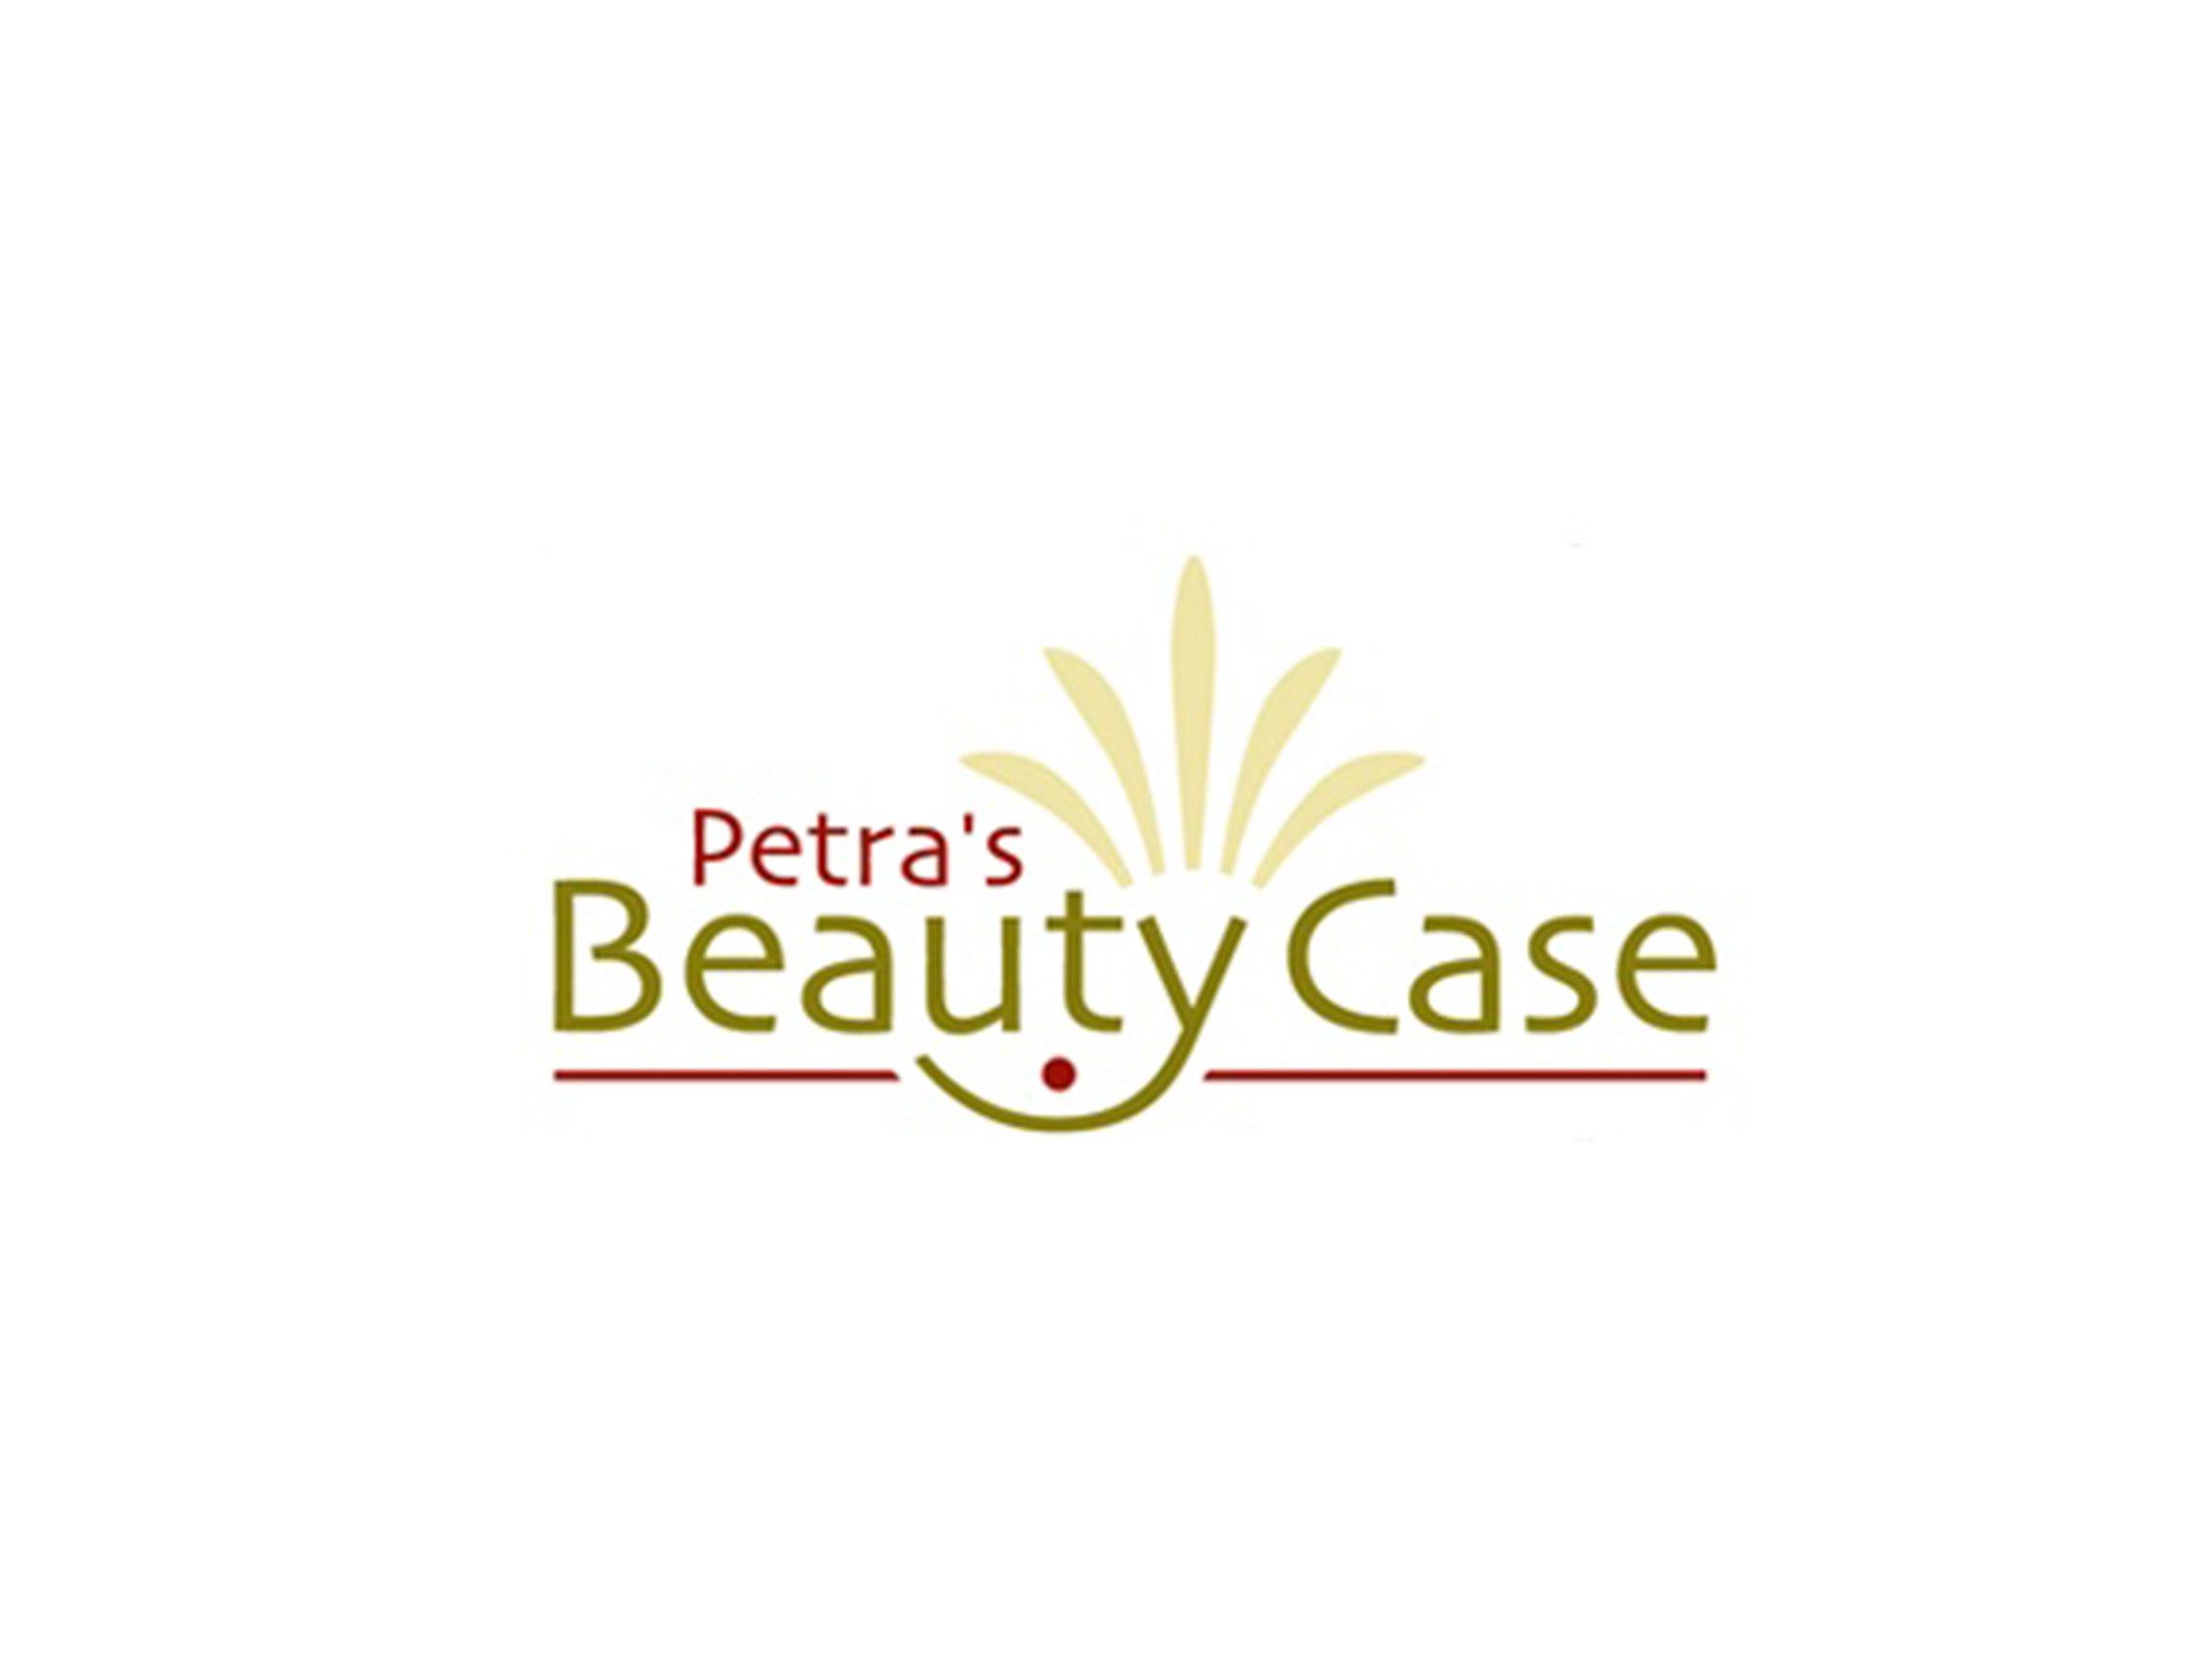 Petra's Beauty Case